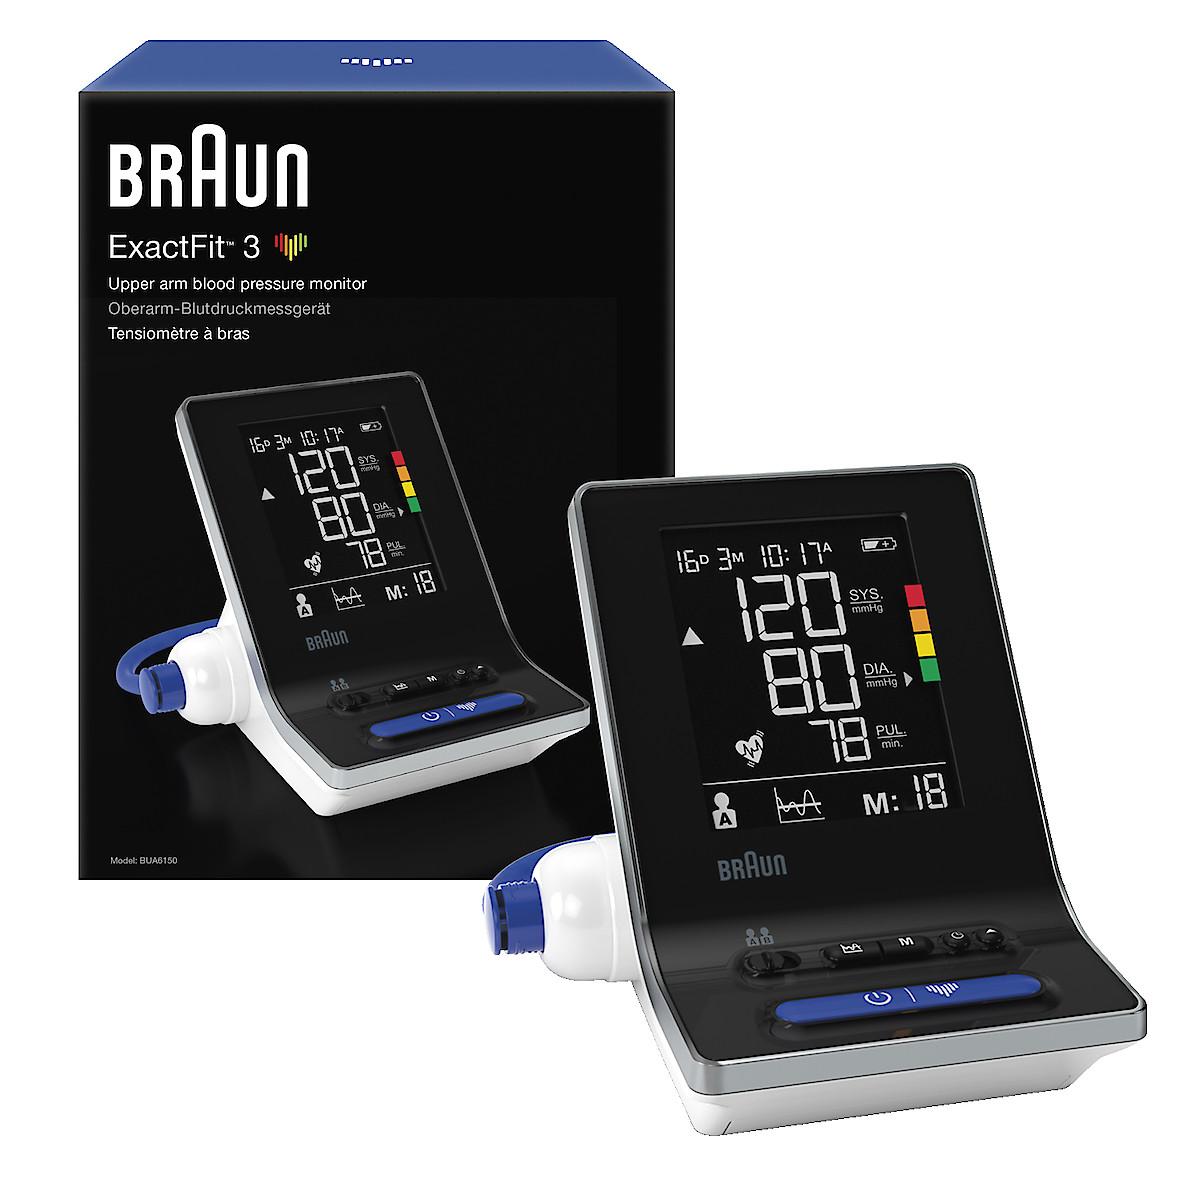 Blodtrycksmätare Braun ExactFit 3, BUA6150